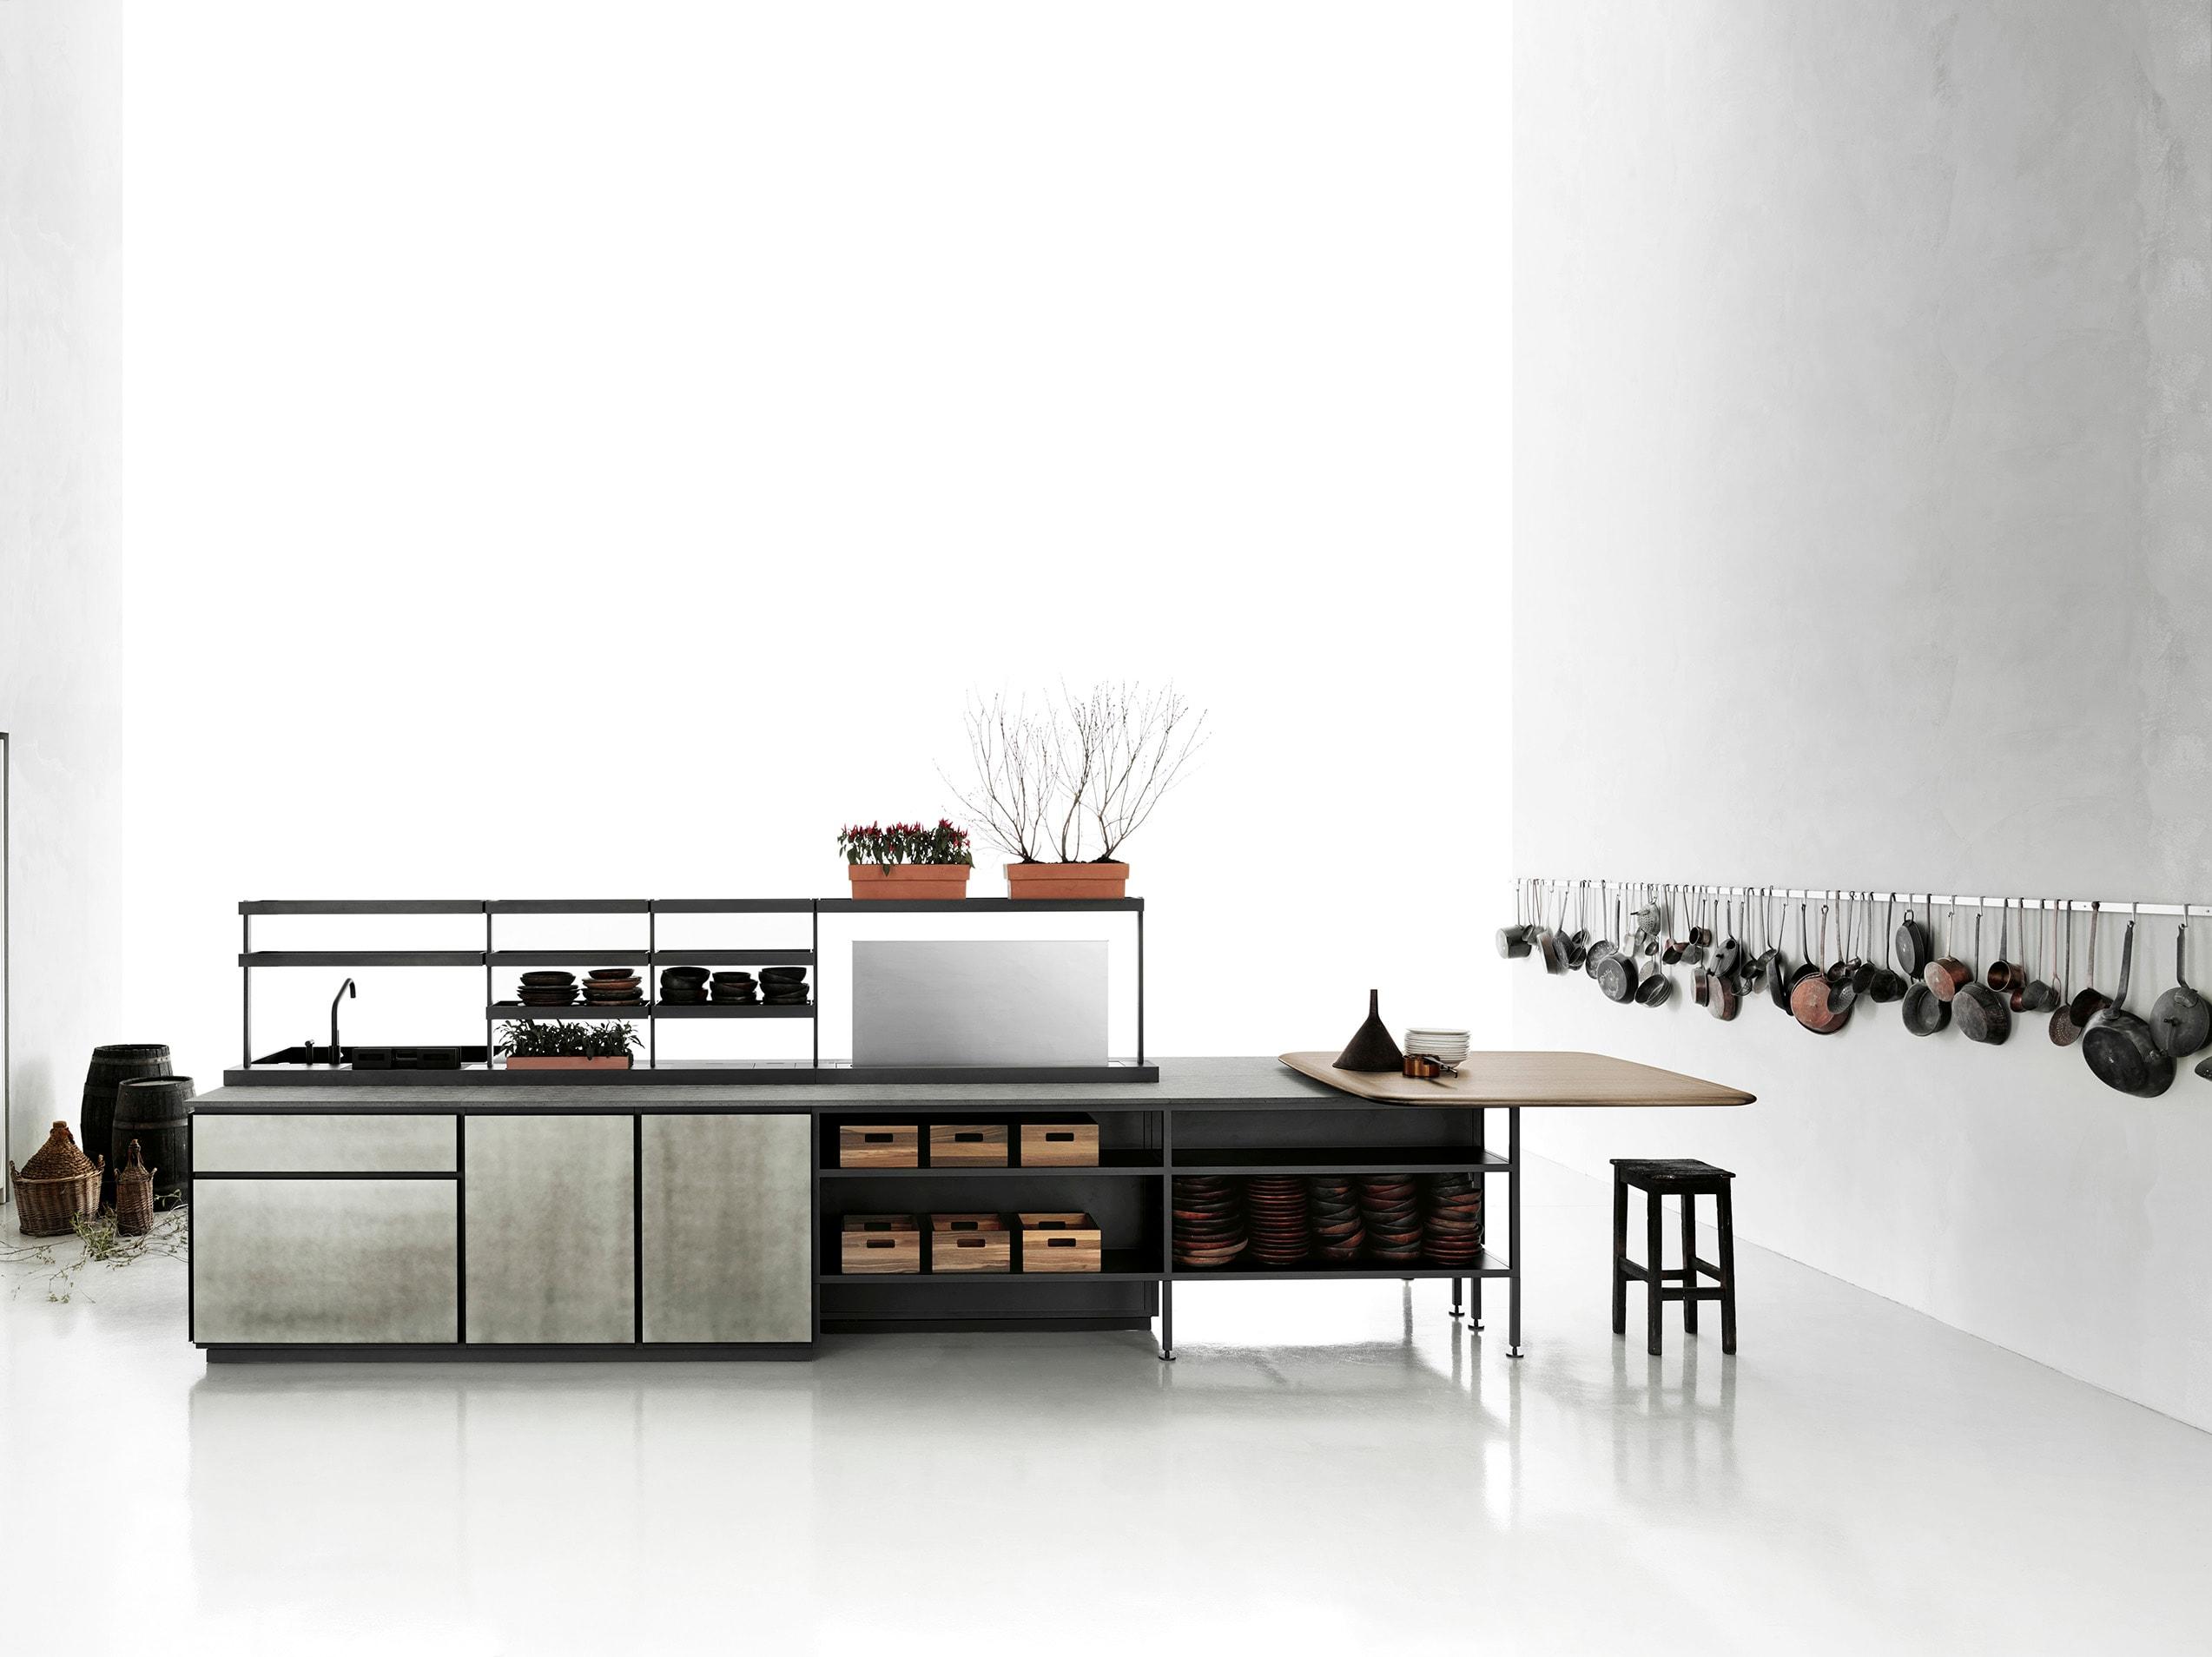 Cucina Scavolini Food Shelf : Cucina ad angolo cad. Cucina a gas ...